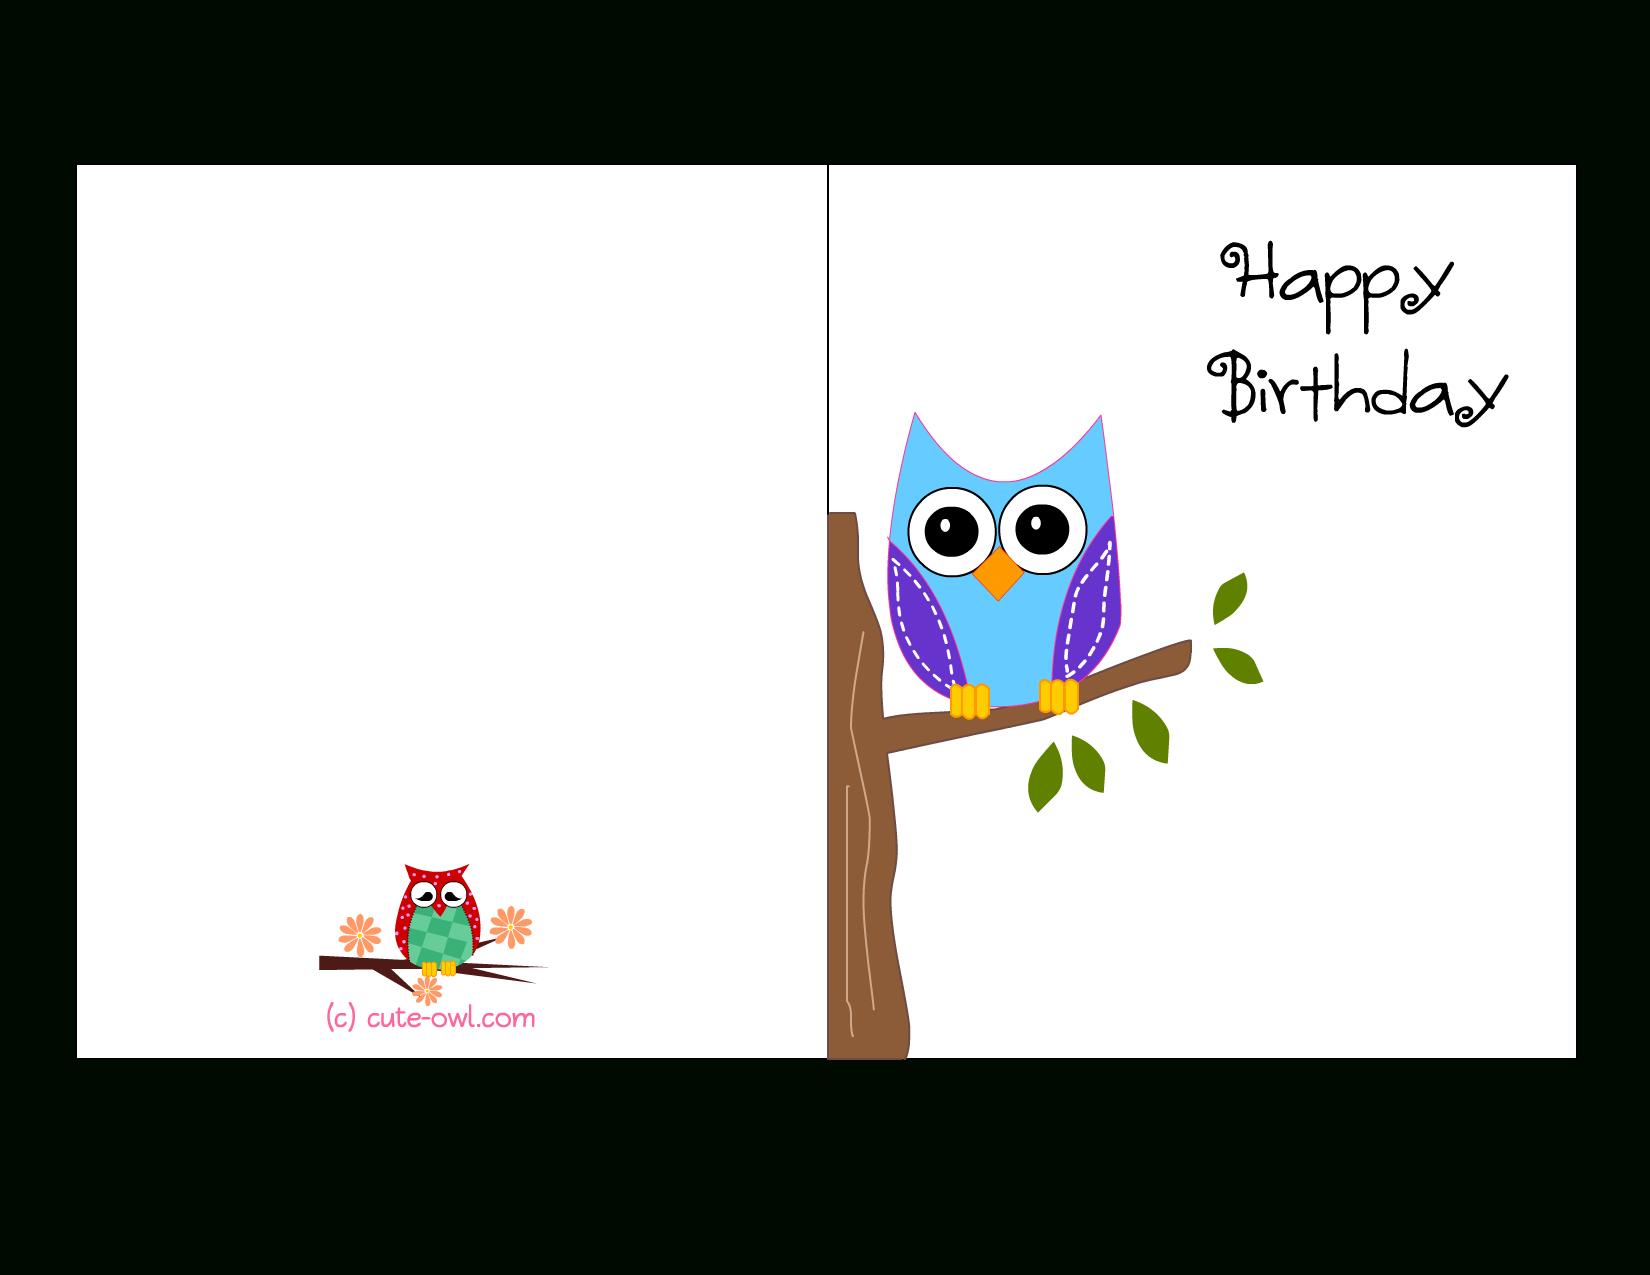 Printable Birthday Cards With Photo - Kaza.psstech.co - Customized Birthday Cards Free Printable